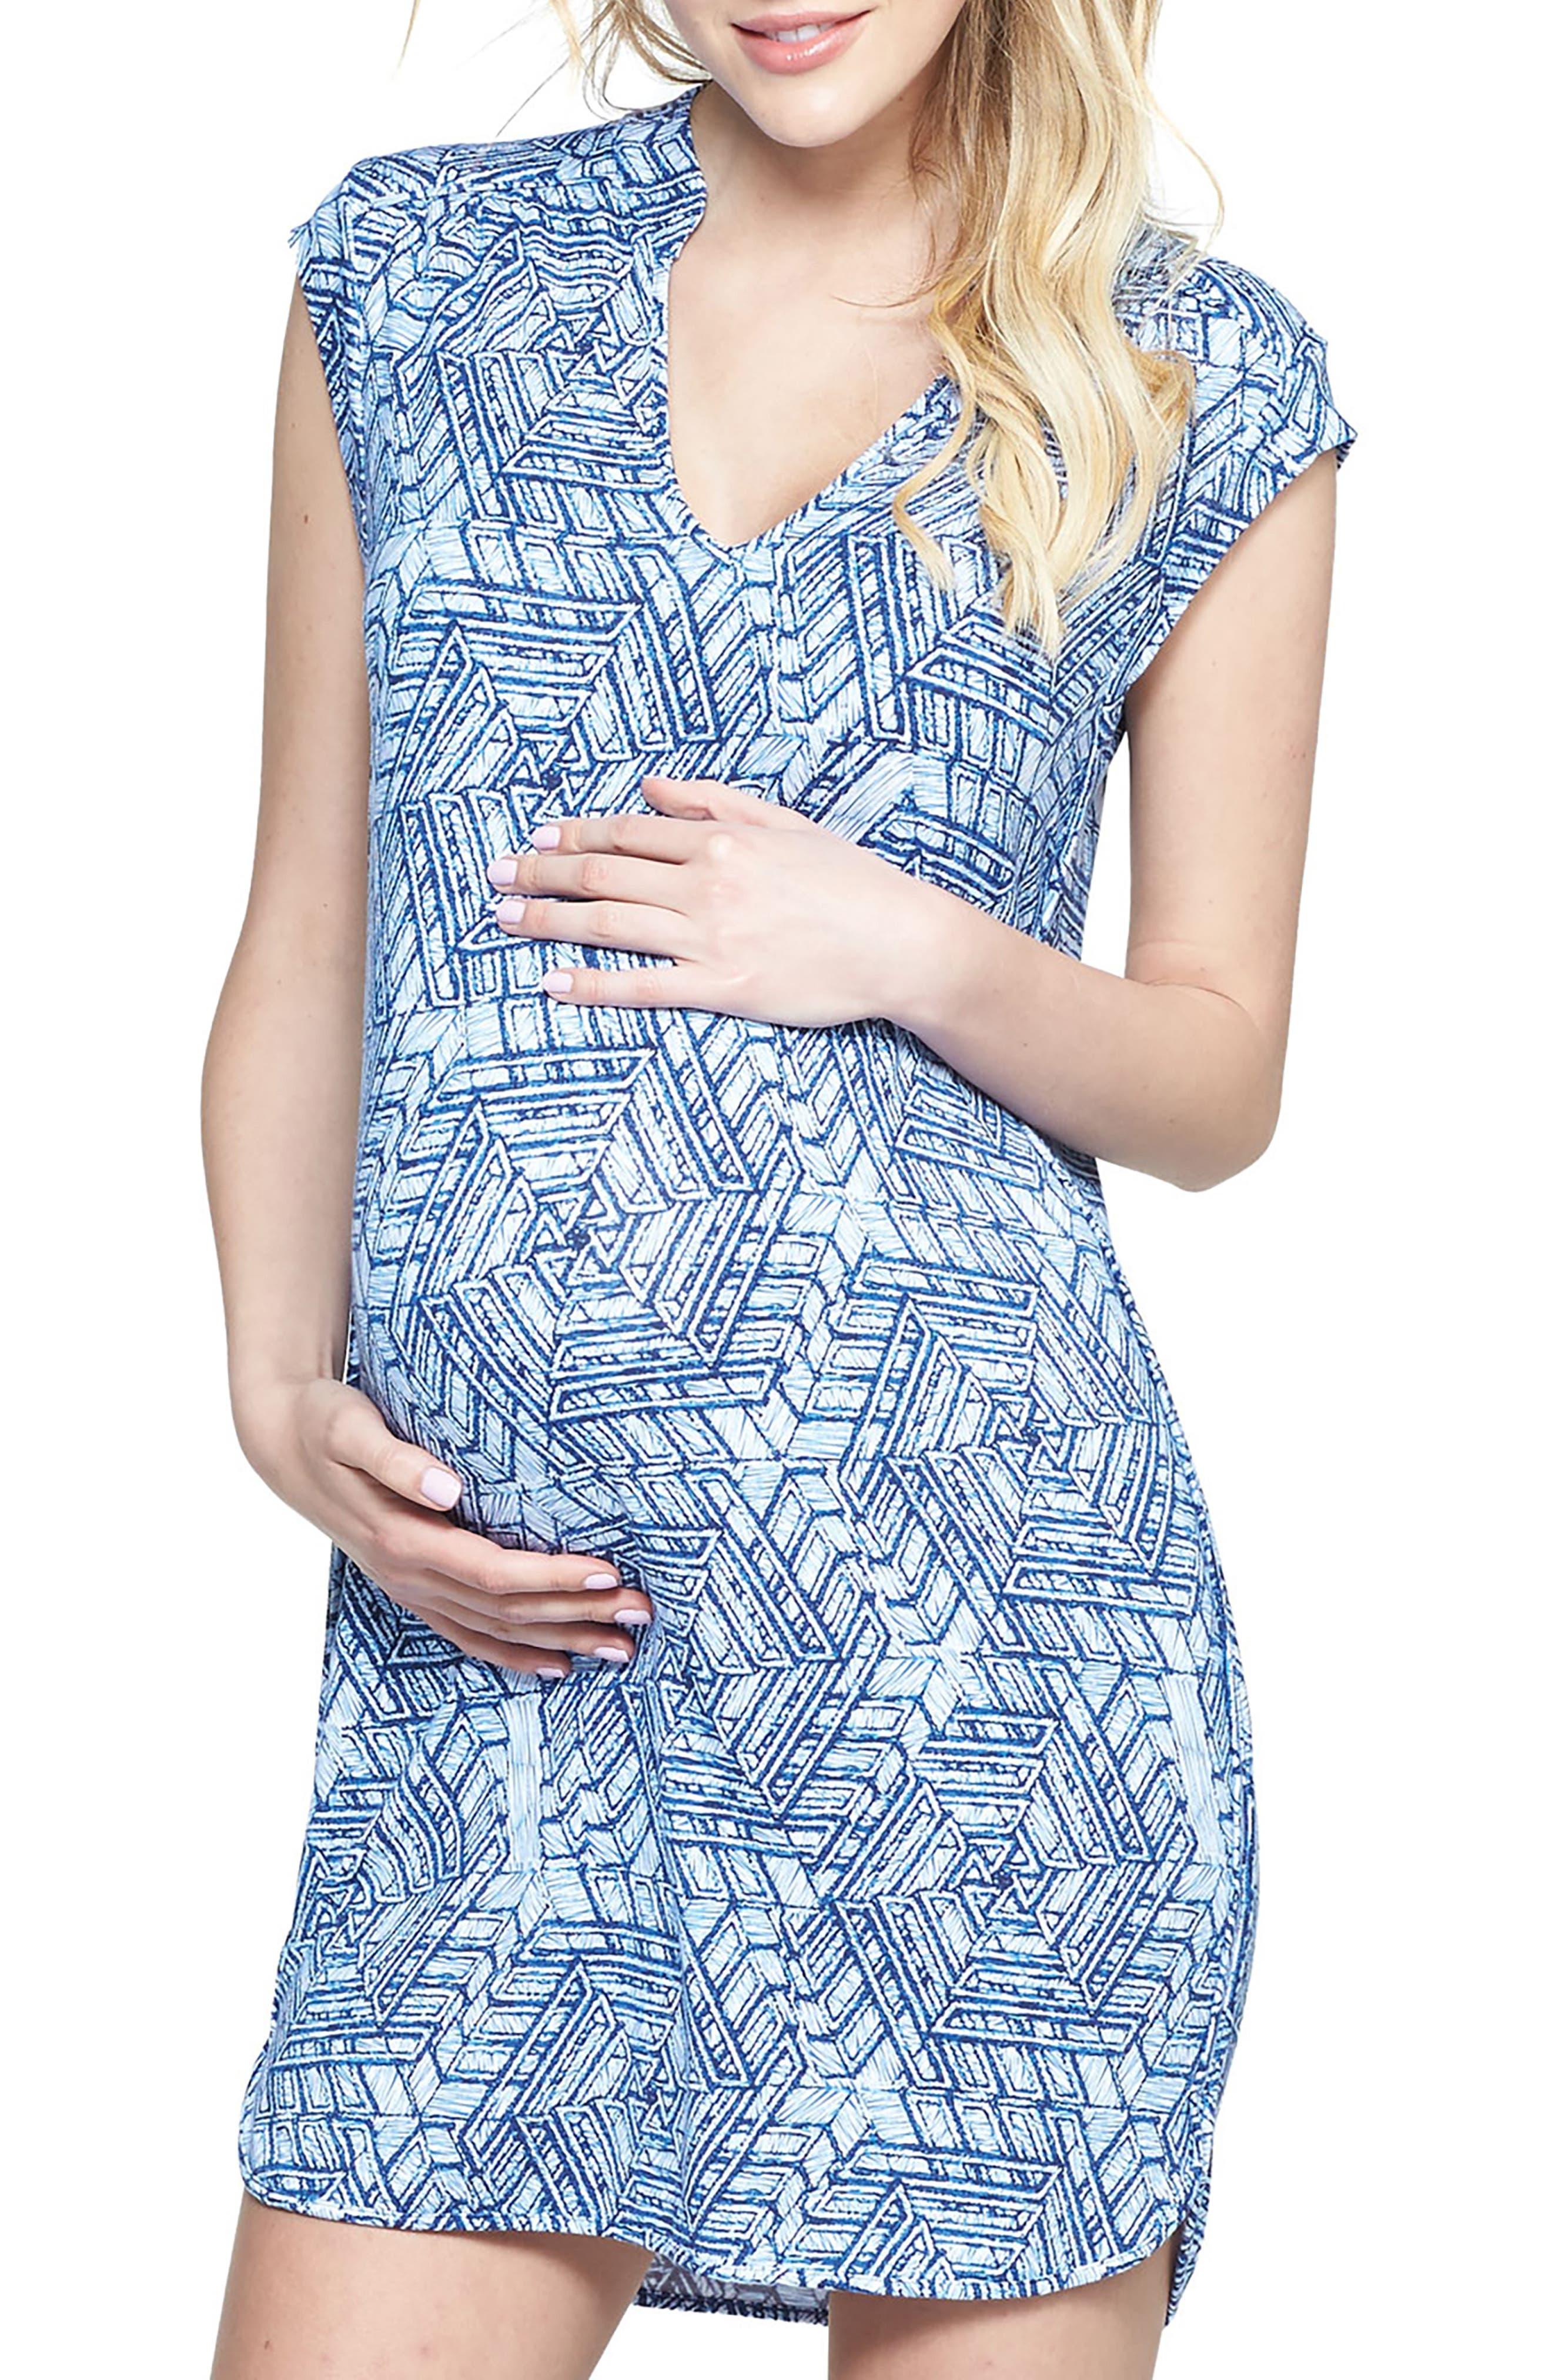 TART MATERNITY, 'Mellie' Embellished Neck Maternity Dress, Main thumbnail 1, color, SCRIBBLE GEO